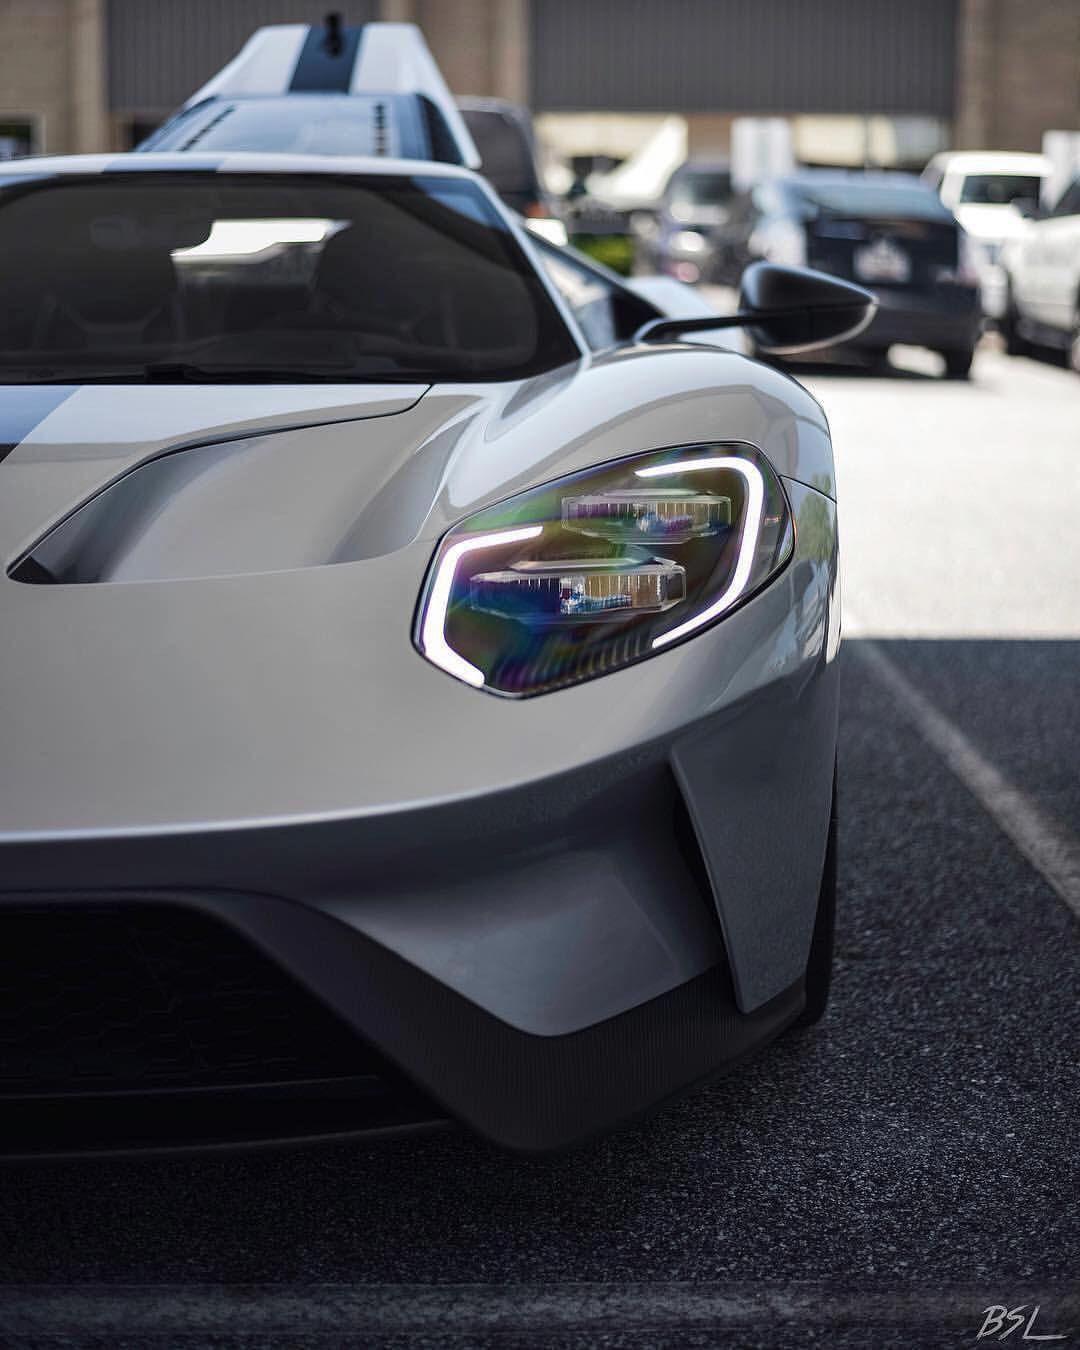 Comentarios Blacklist Lifestyle Cars Black_list No Instagram  C B Super Carsford Gtcar